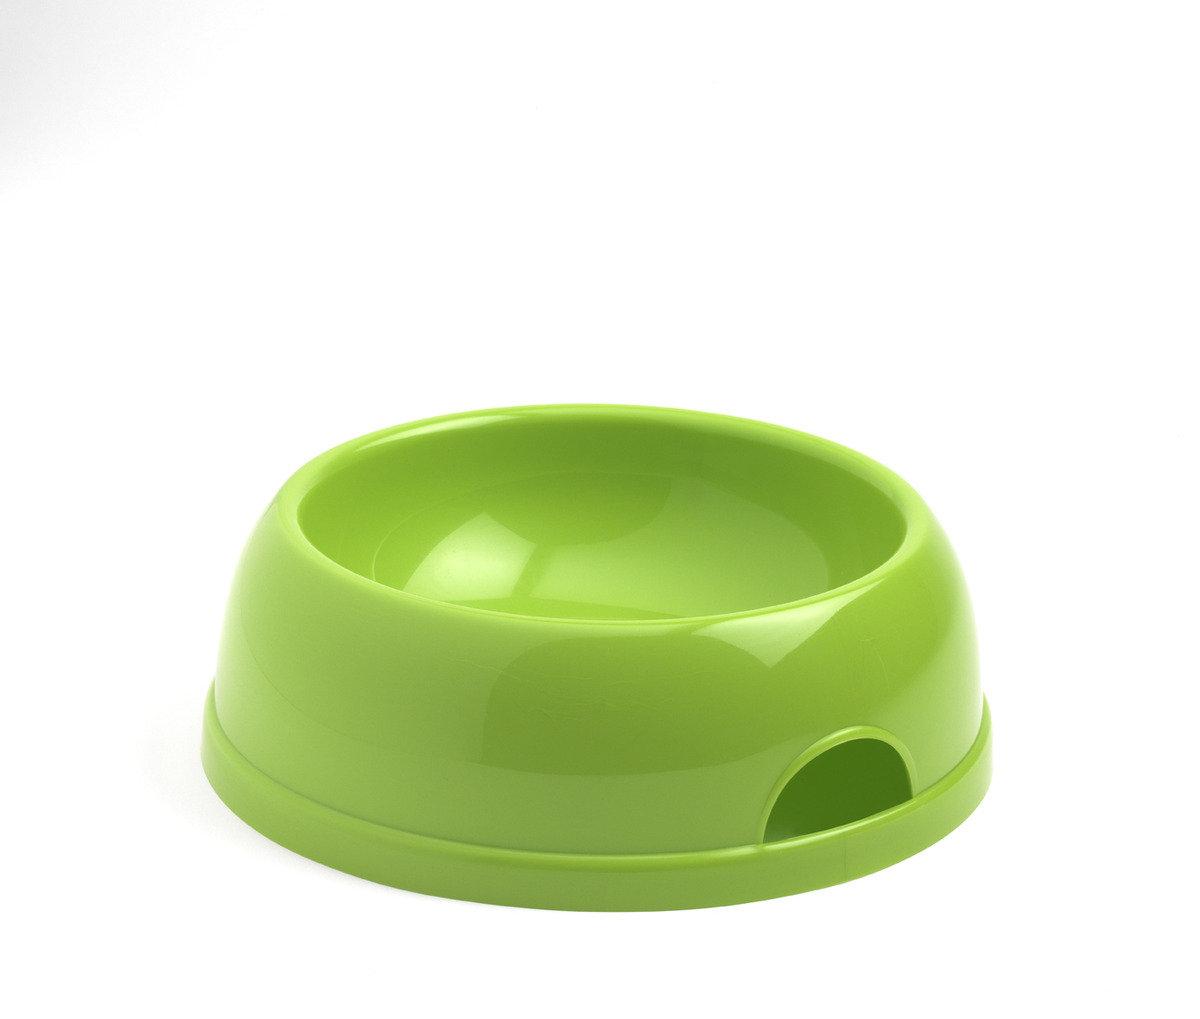 Eco Bowl  寵物碗 H113  - 淺綠色